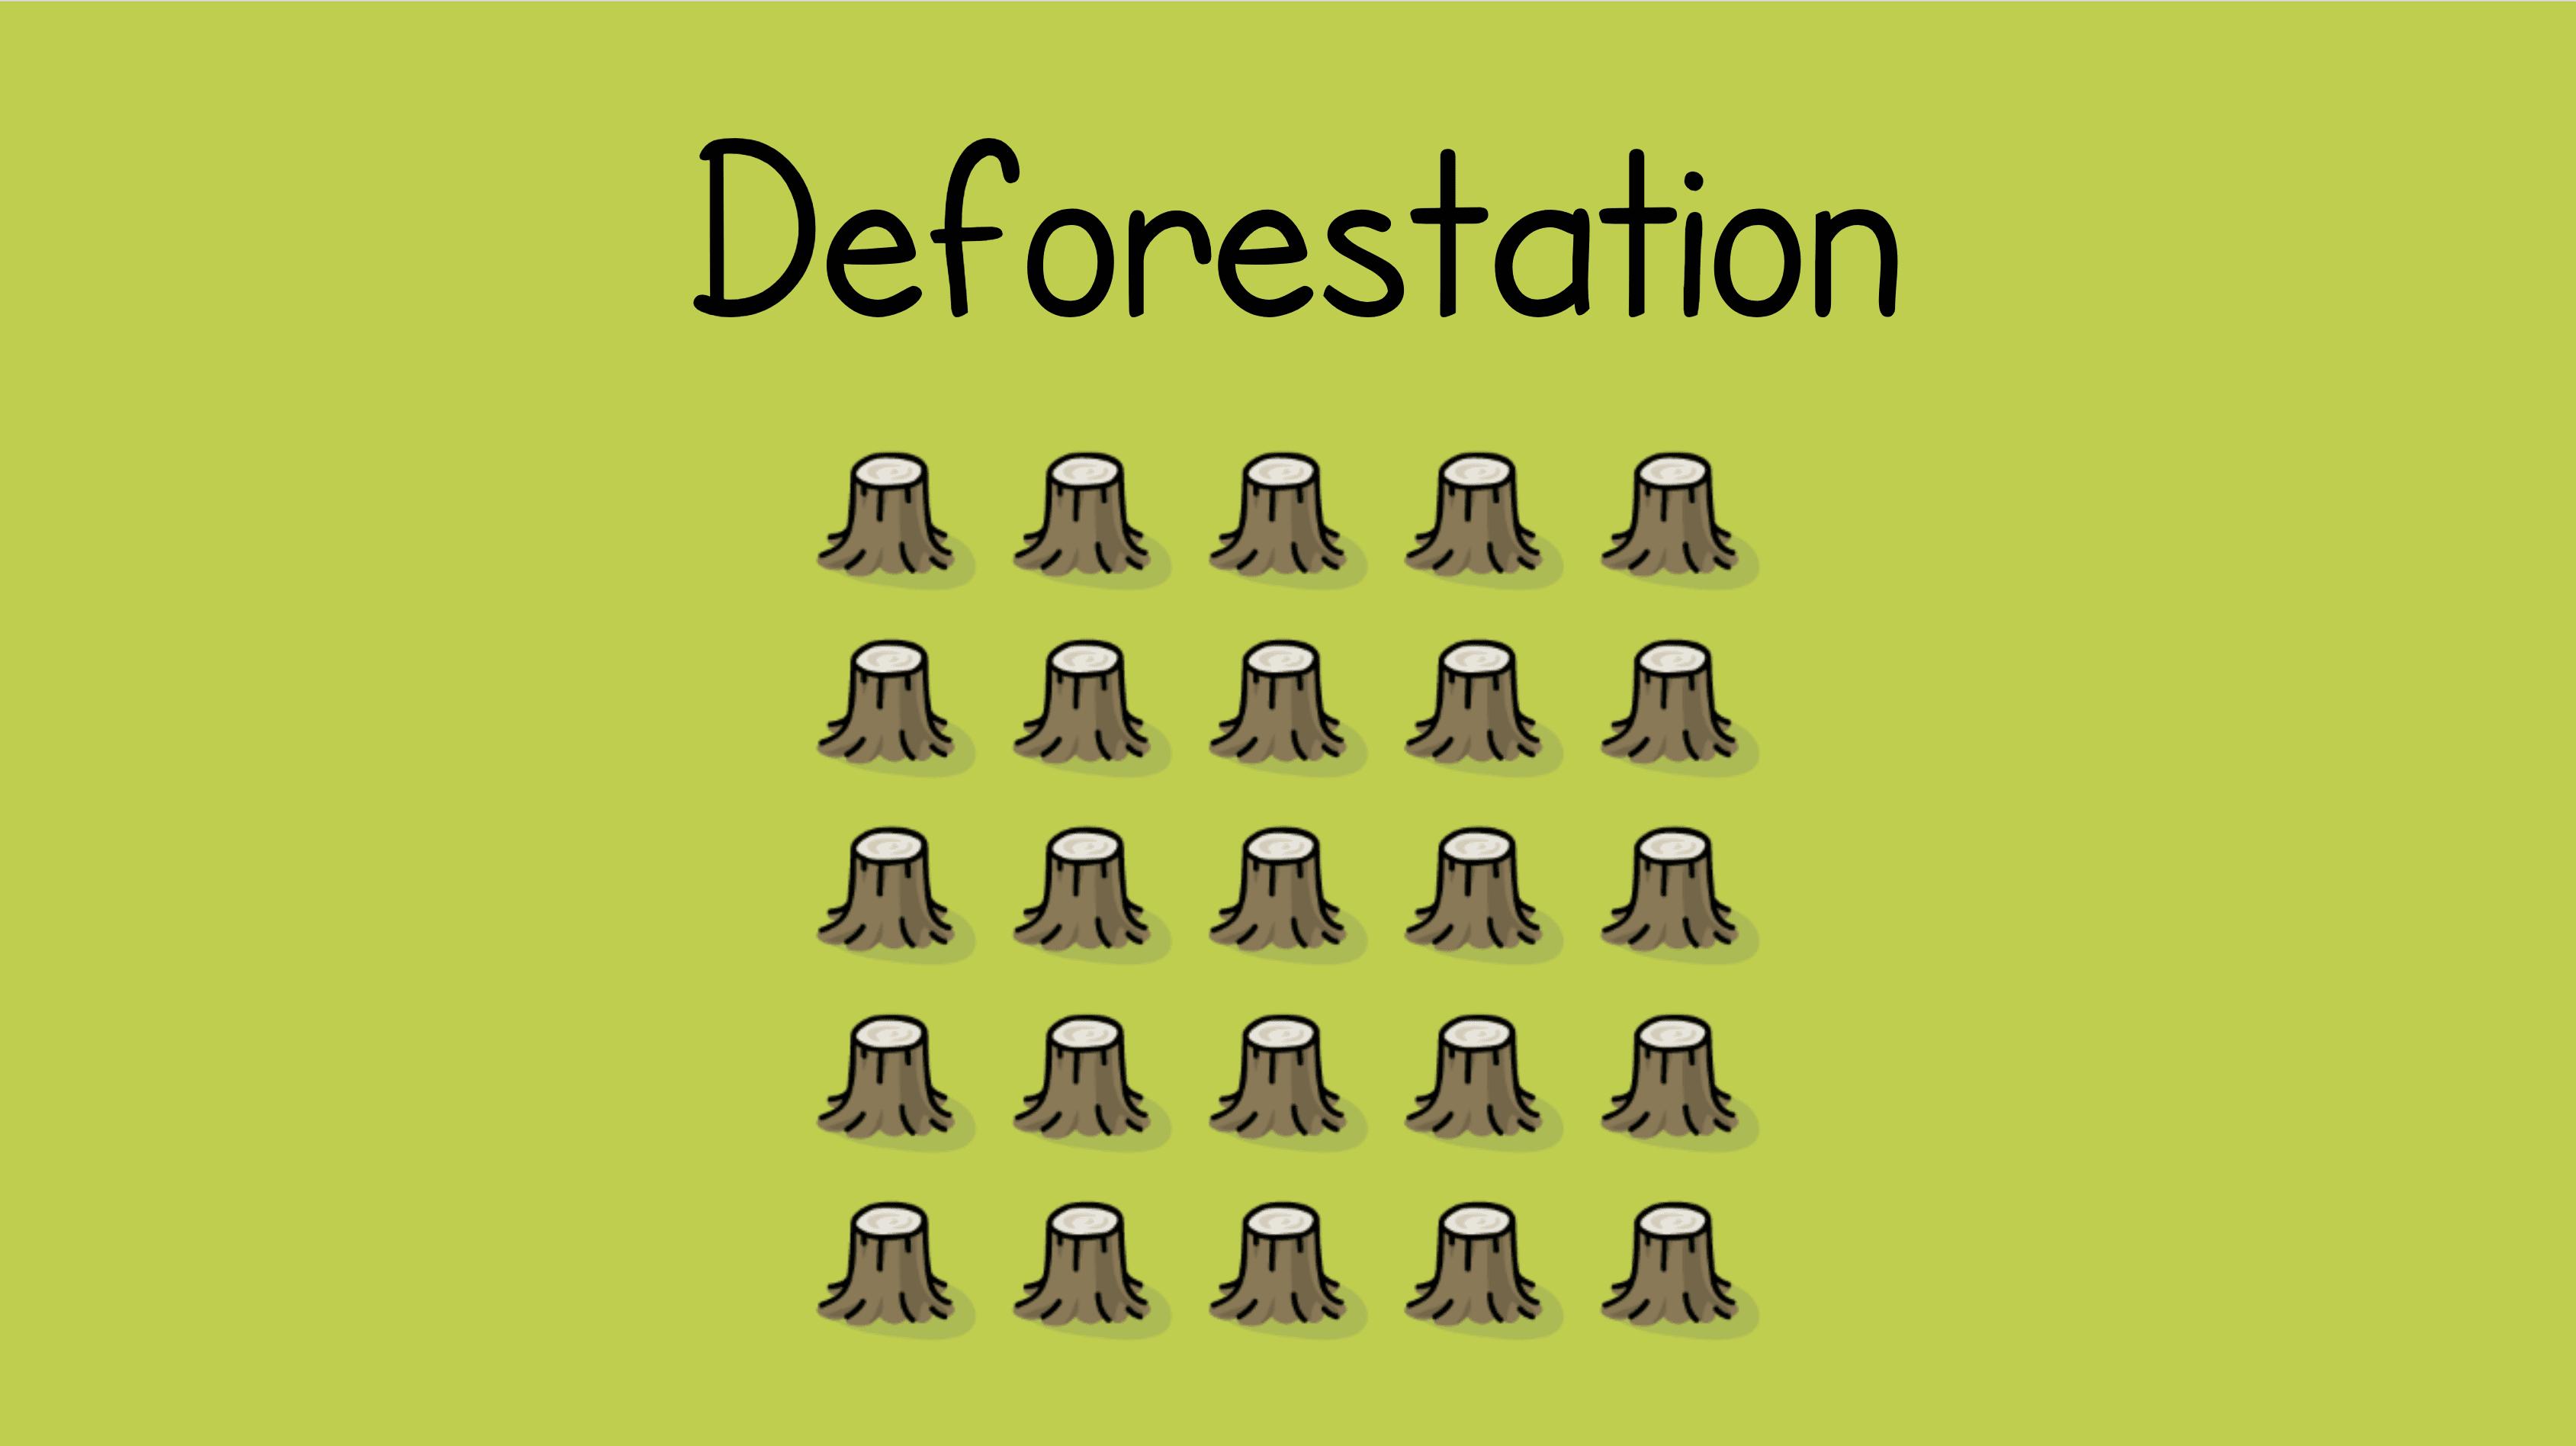 Year 7 - Deforestation Presentation